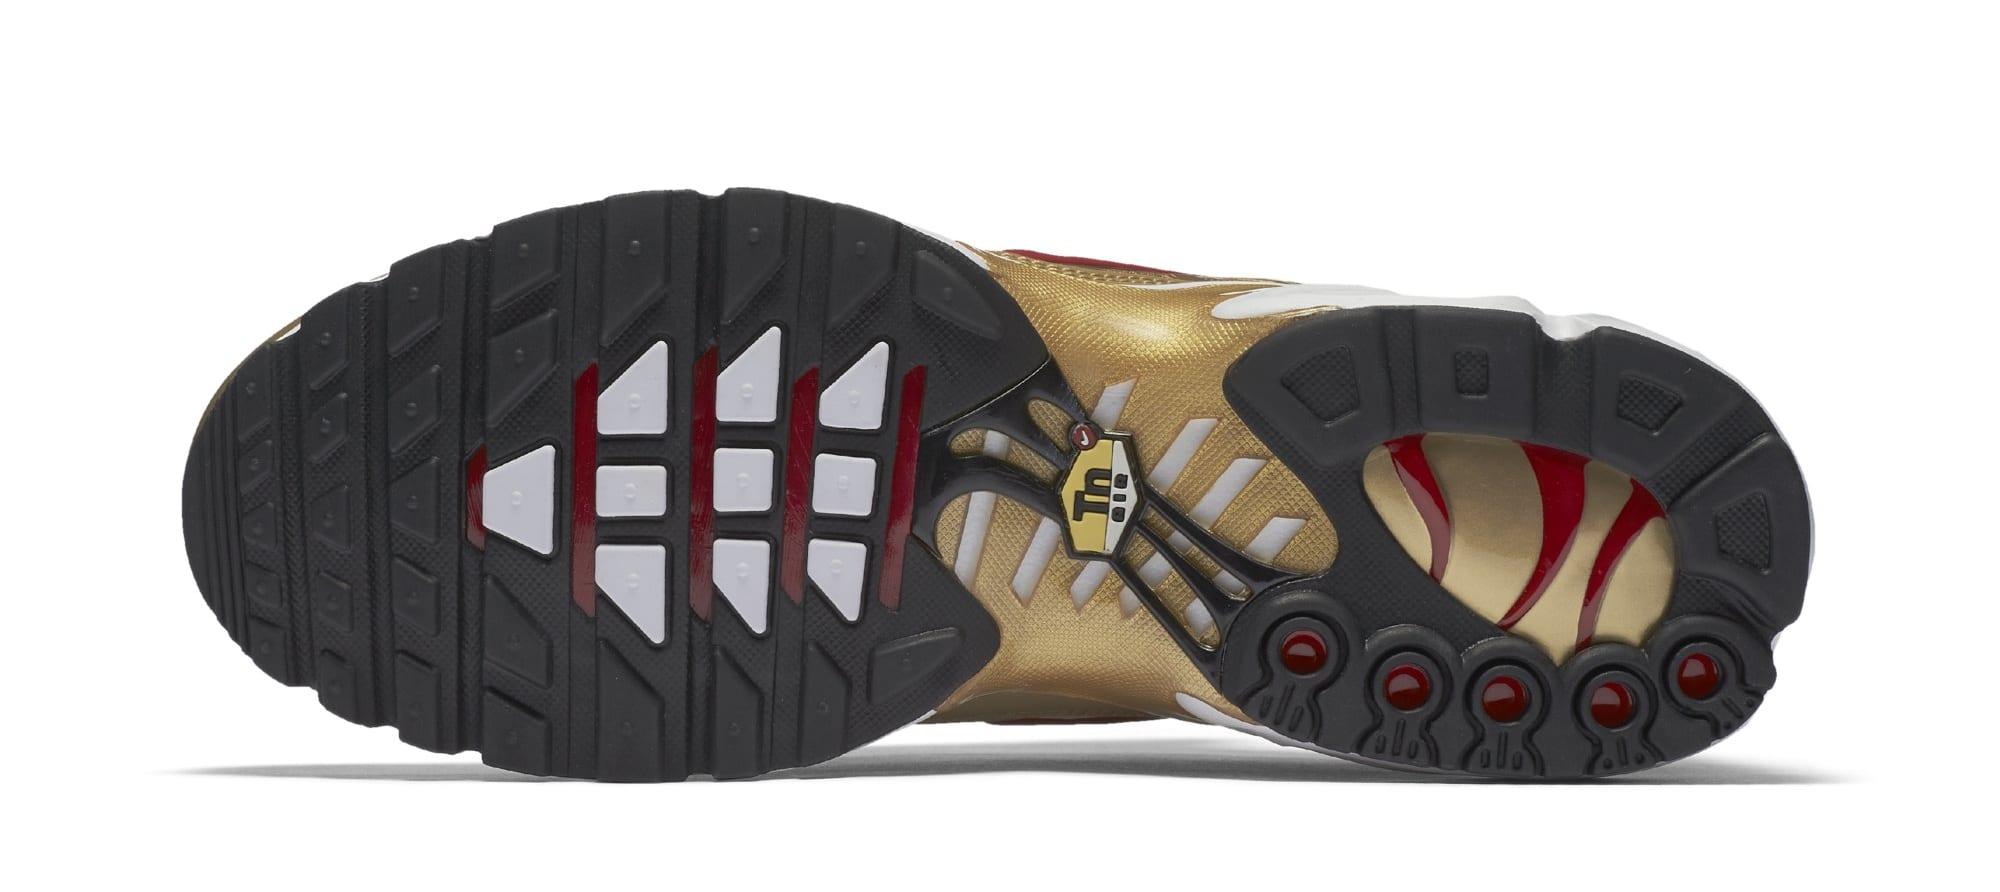 Nike Air Max Plus 'Metallic Gold' 903827-700 (Sole)